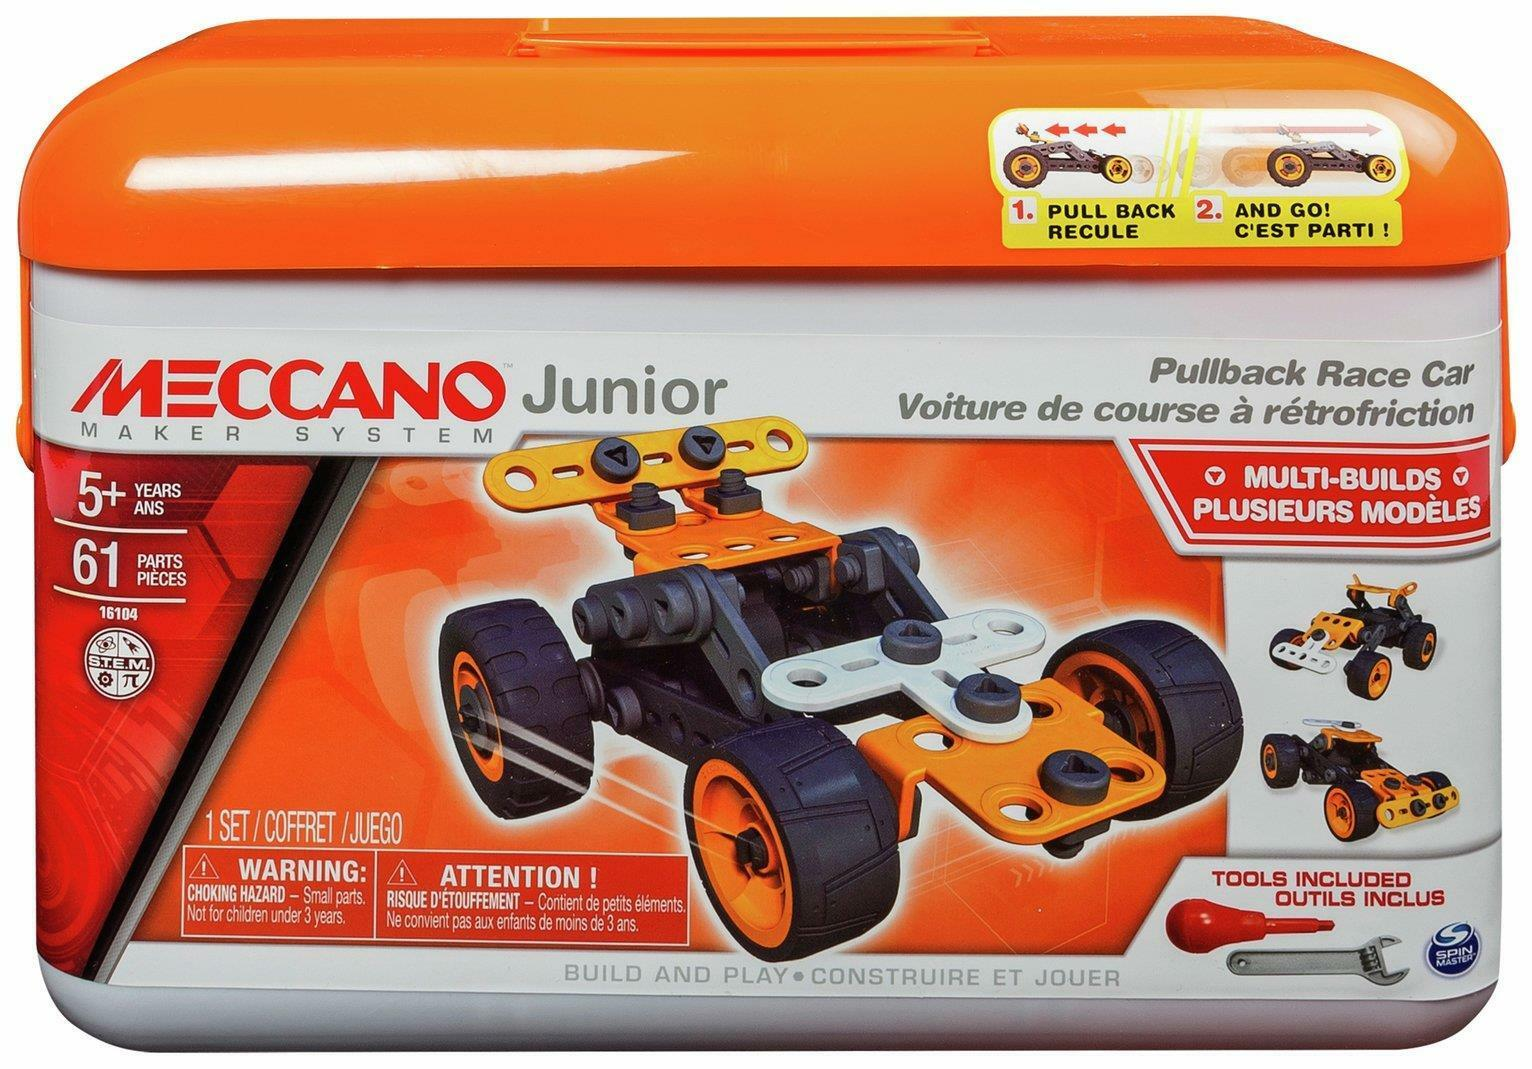 Meccano Junior Tool Box Assortment UK